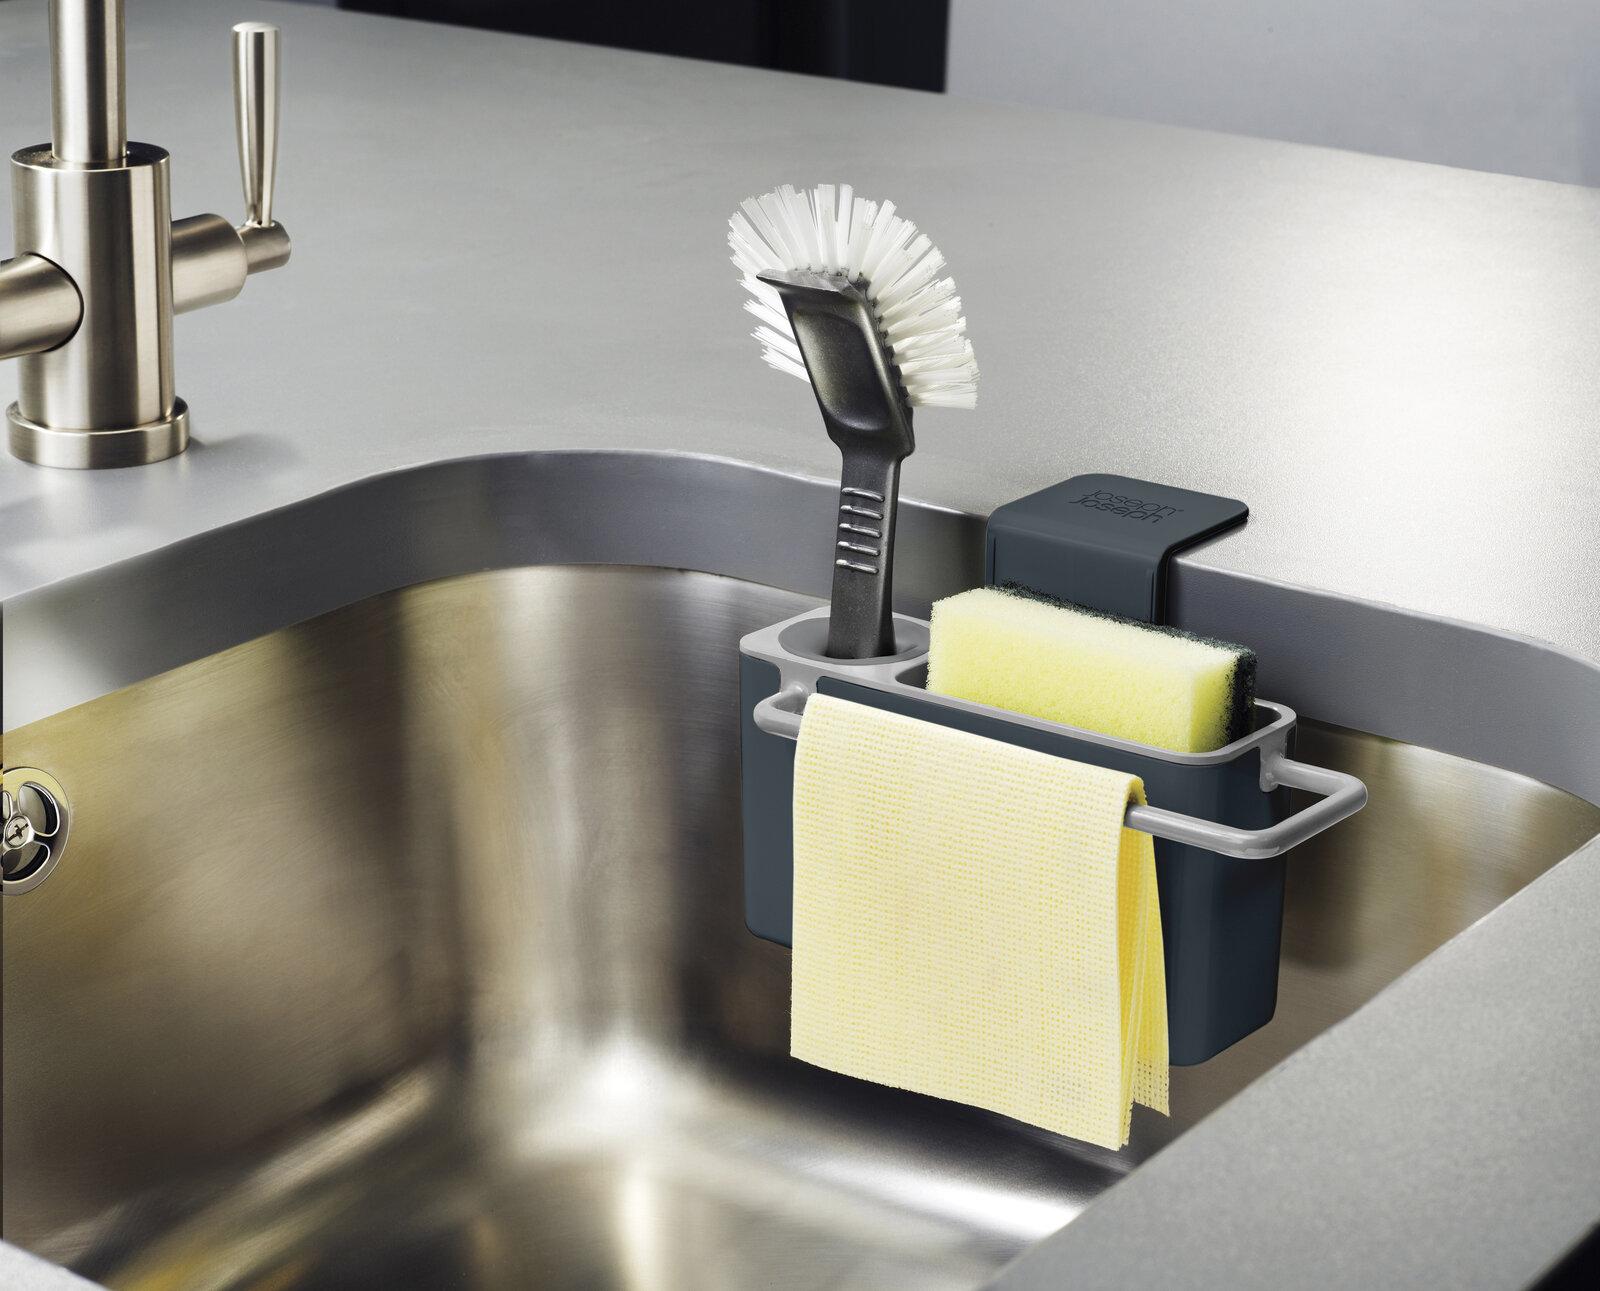 Joseph Joseph Sink Aid Self Draining Sink Caddy U0026 Reviews | Wayfair